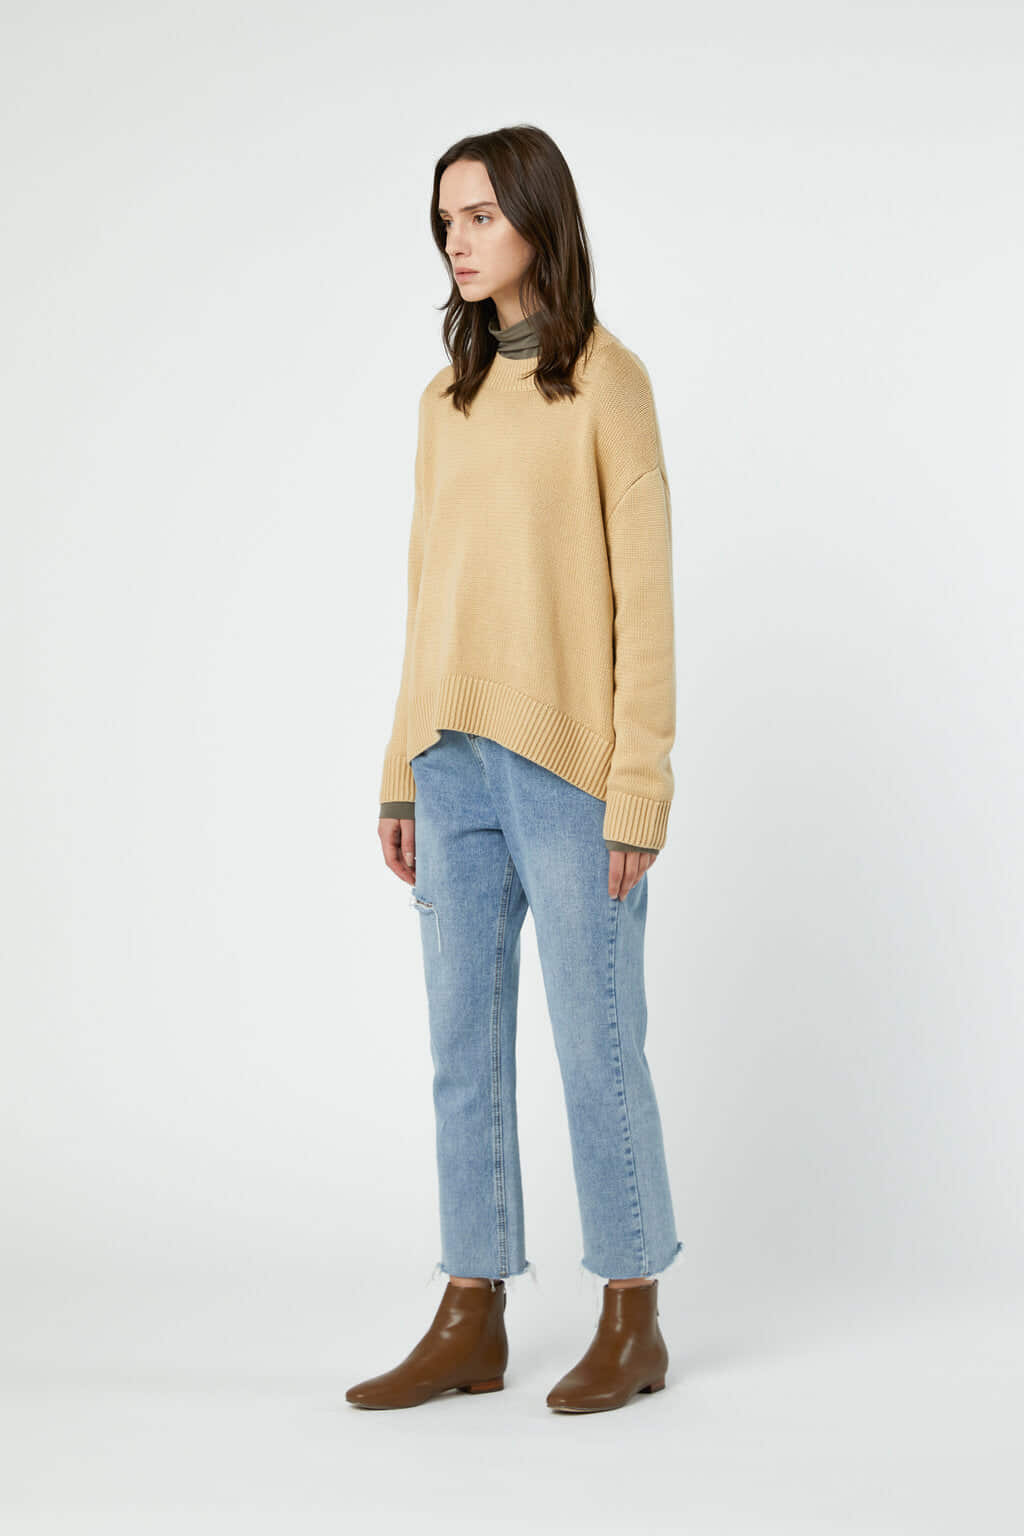 Sweater 3322 Cream 3